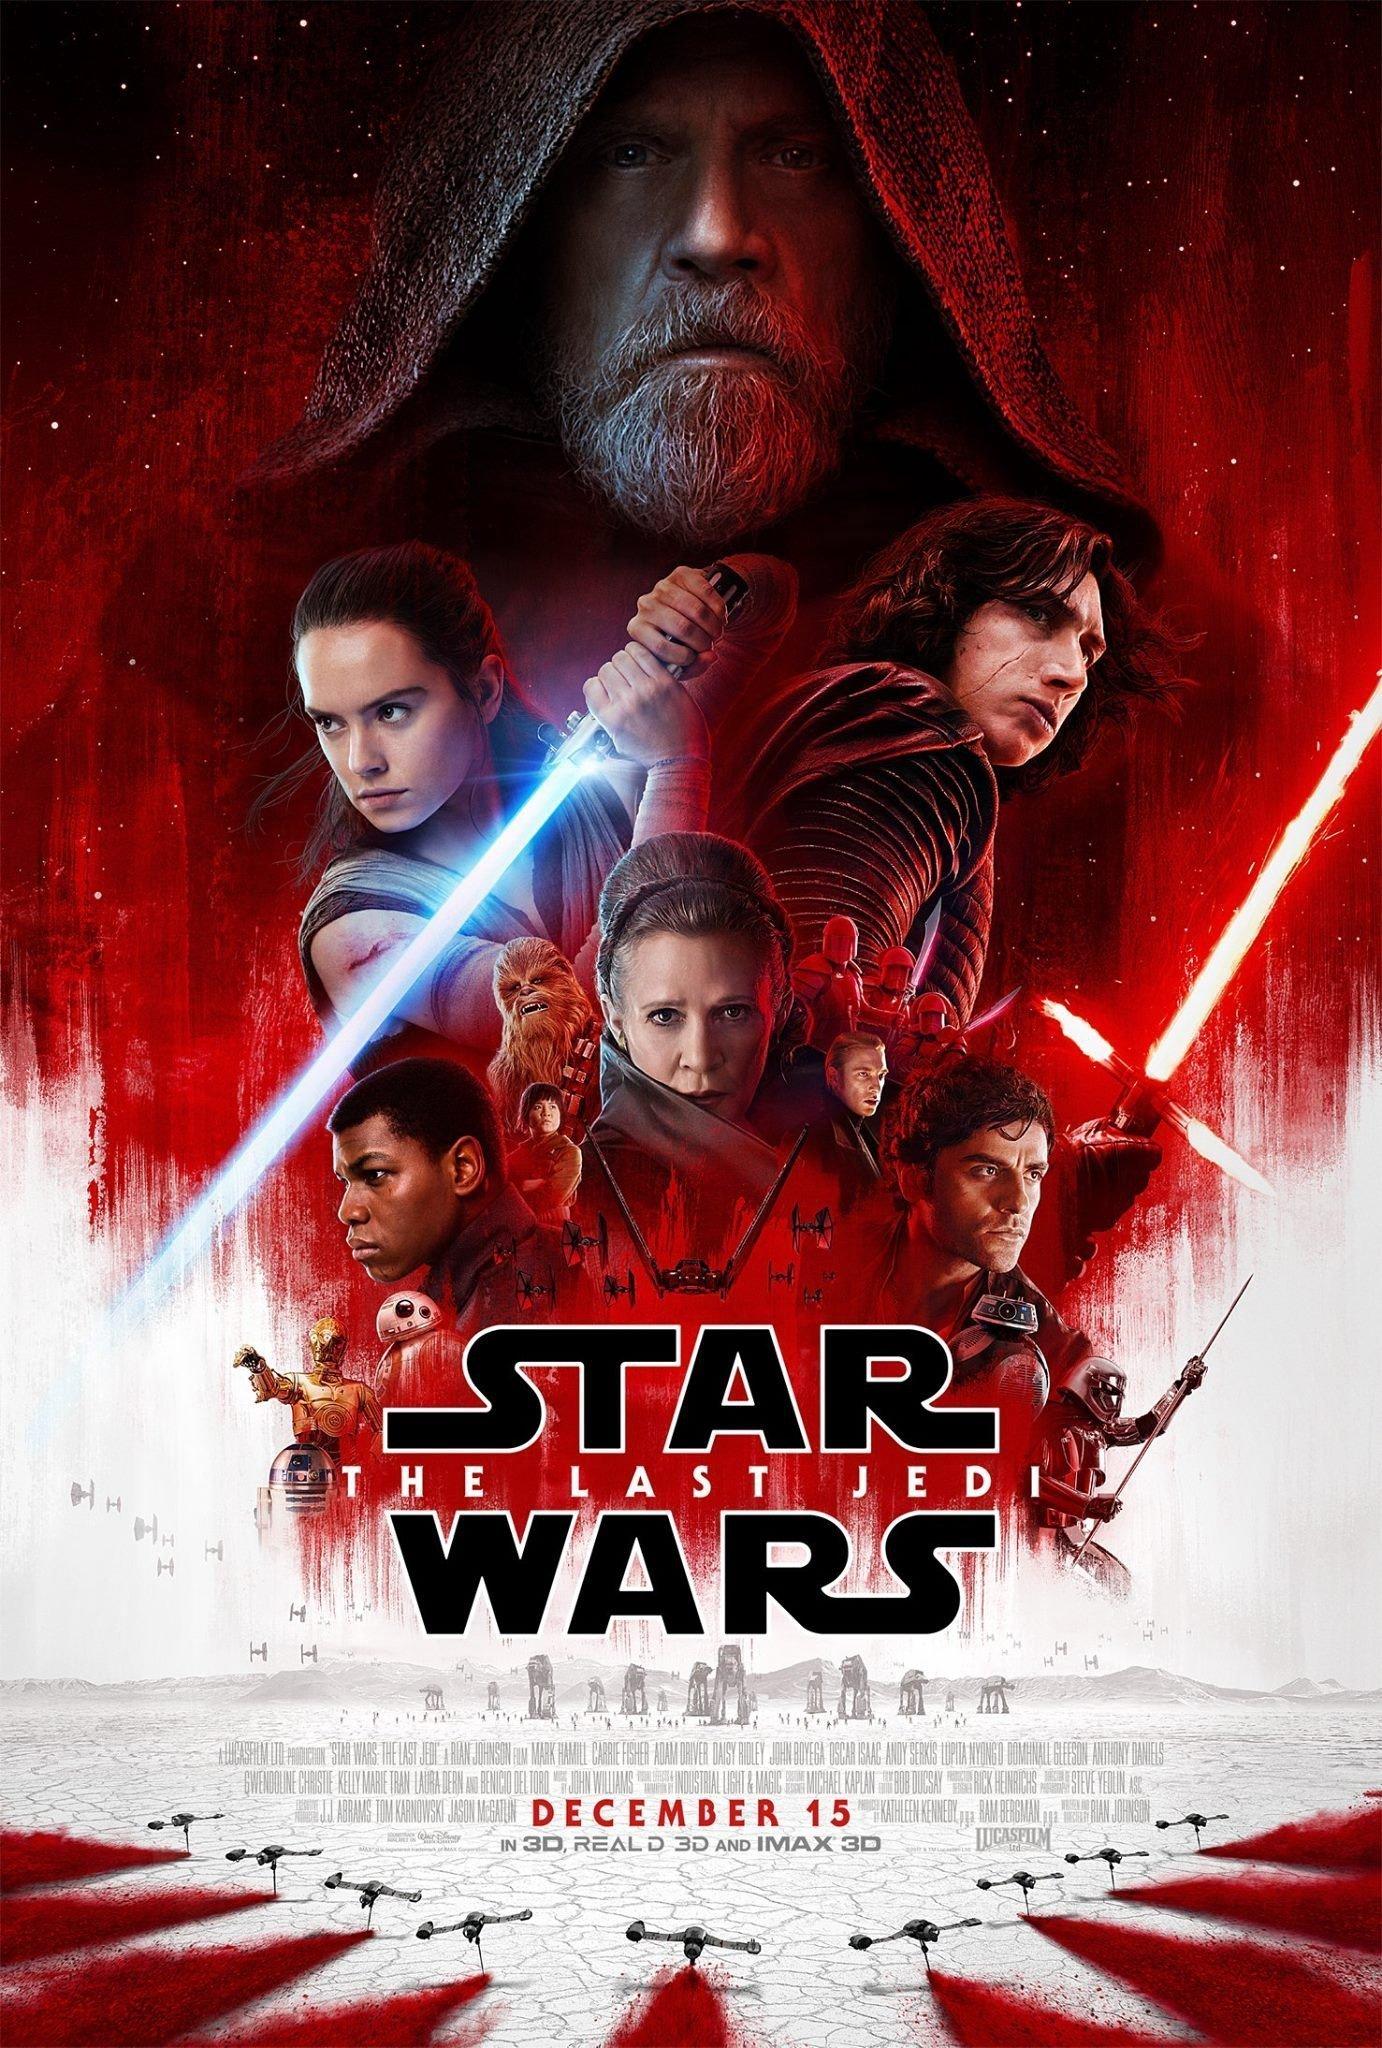 Poster final du film Star Wars: Les Derniers Jedi